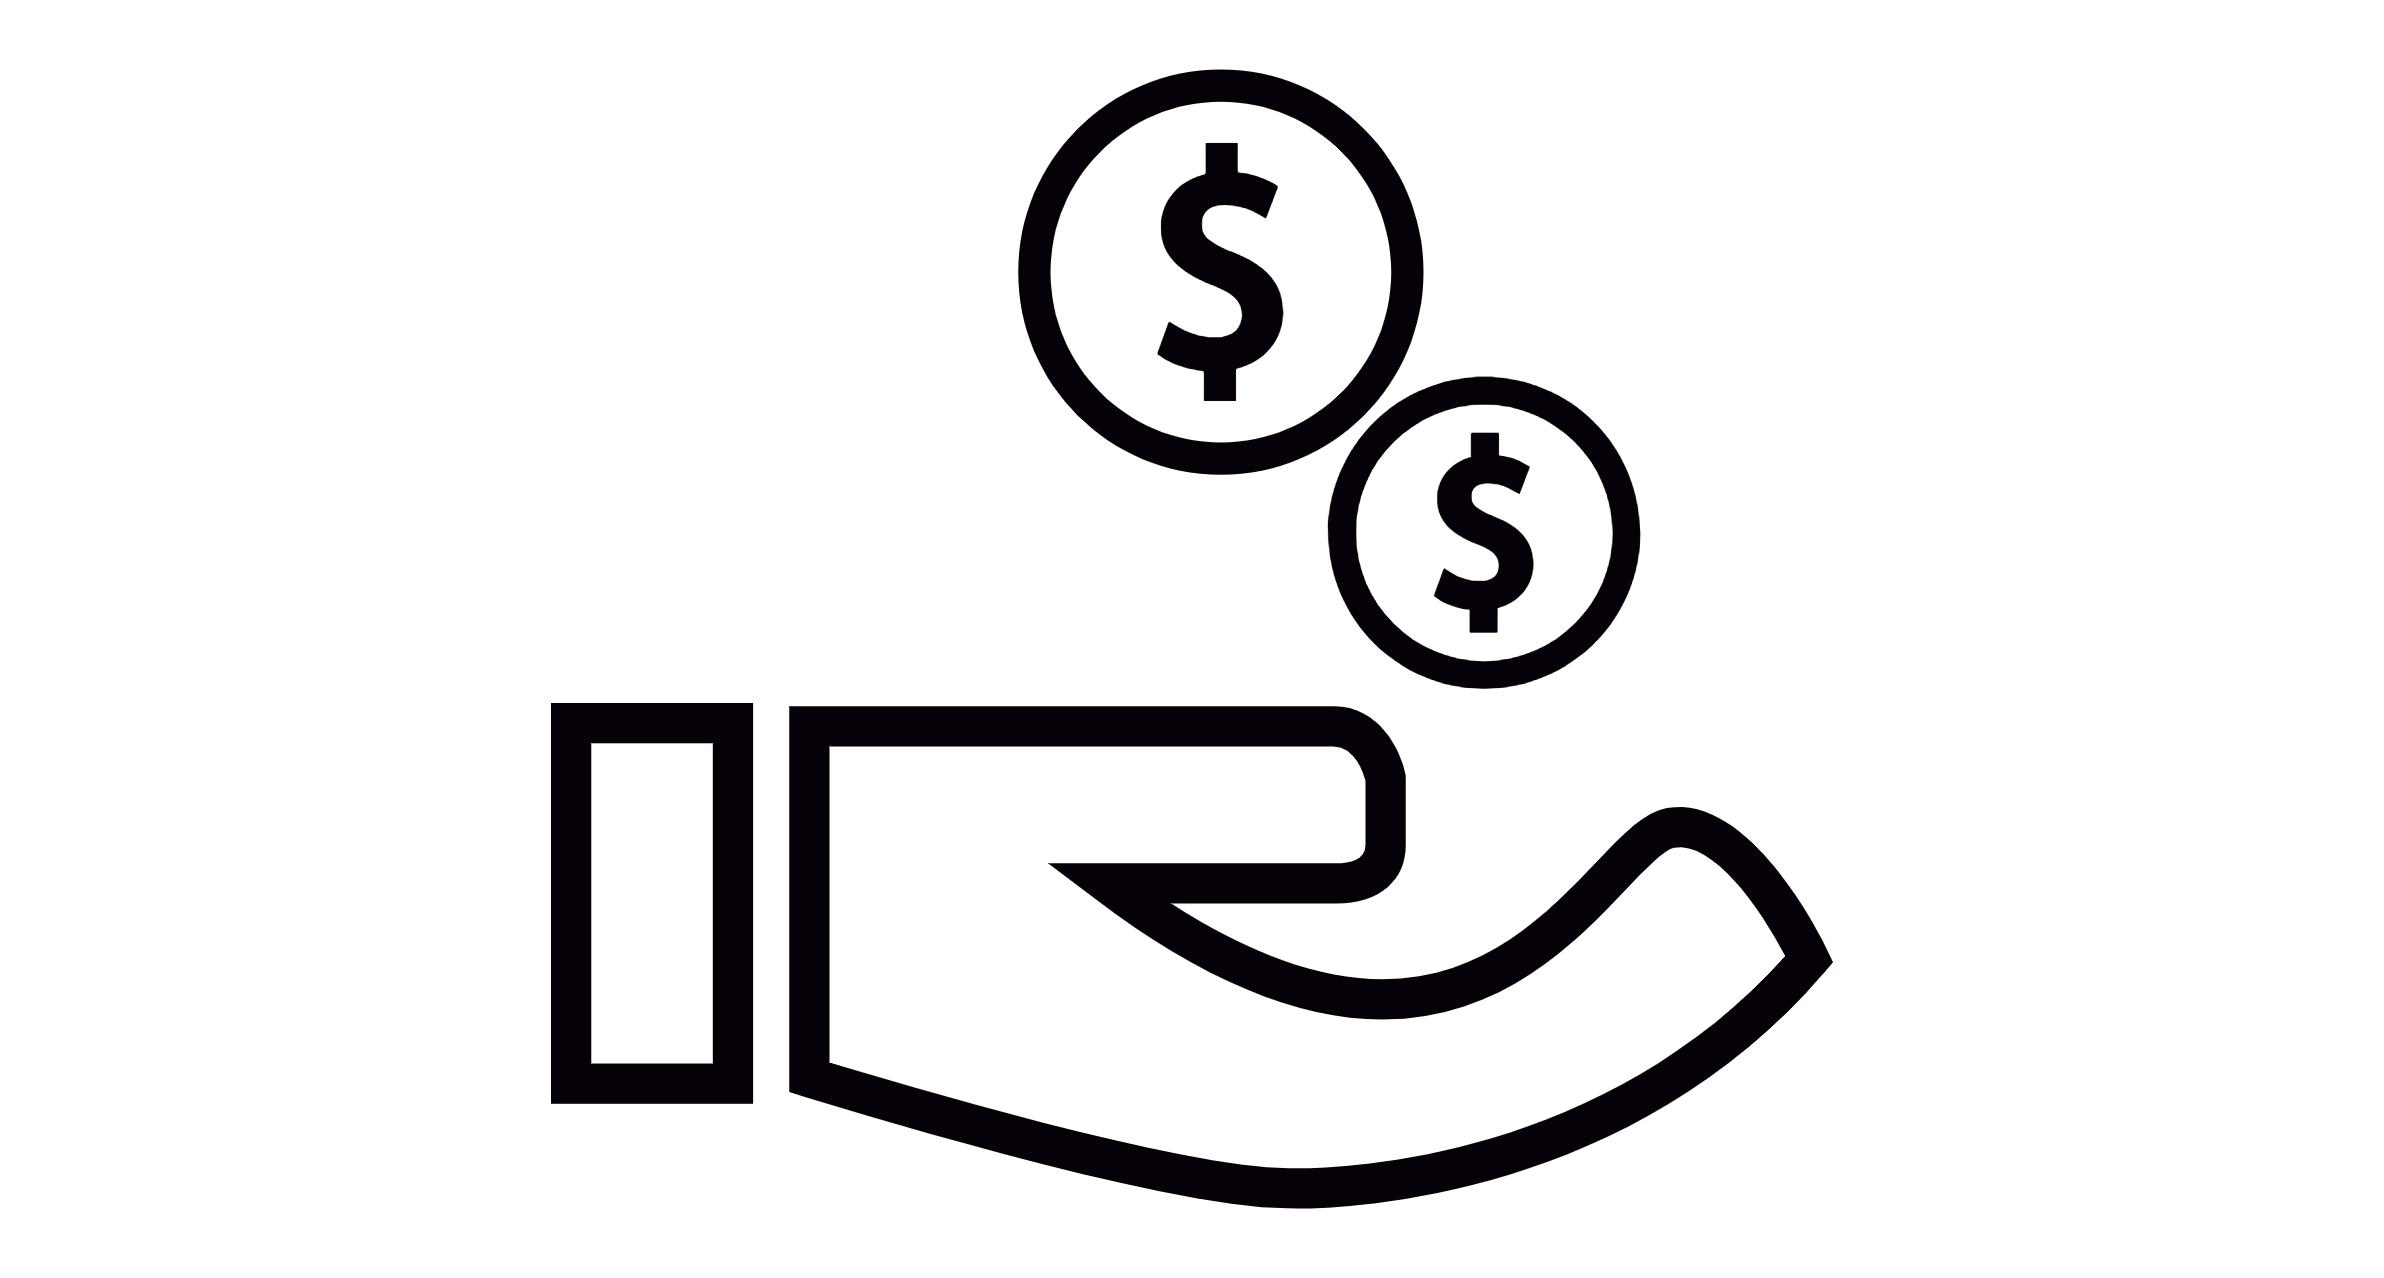 www.bankofthewest.com/getmycard